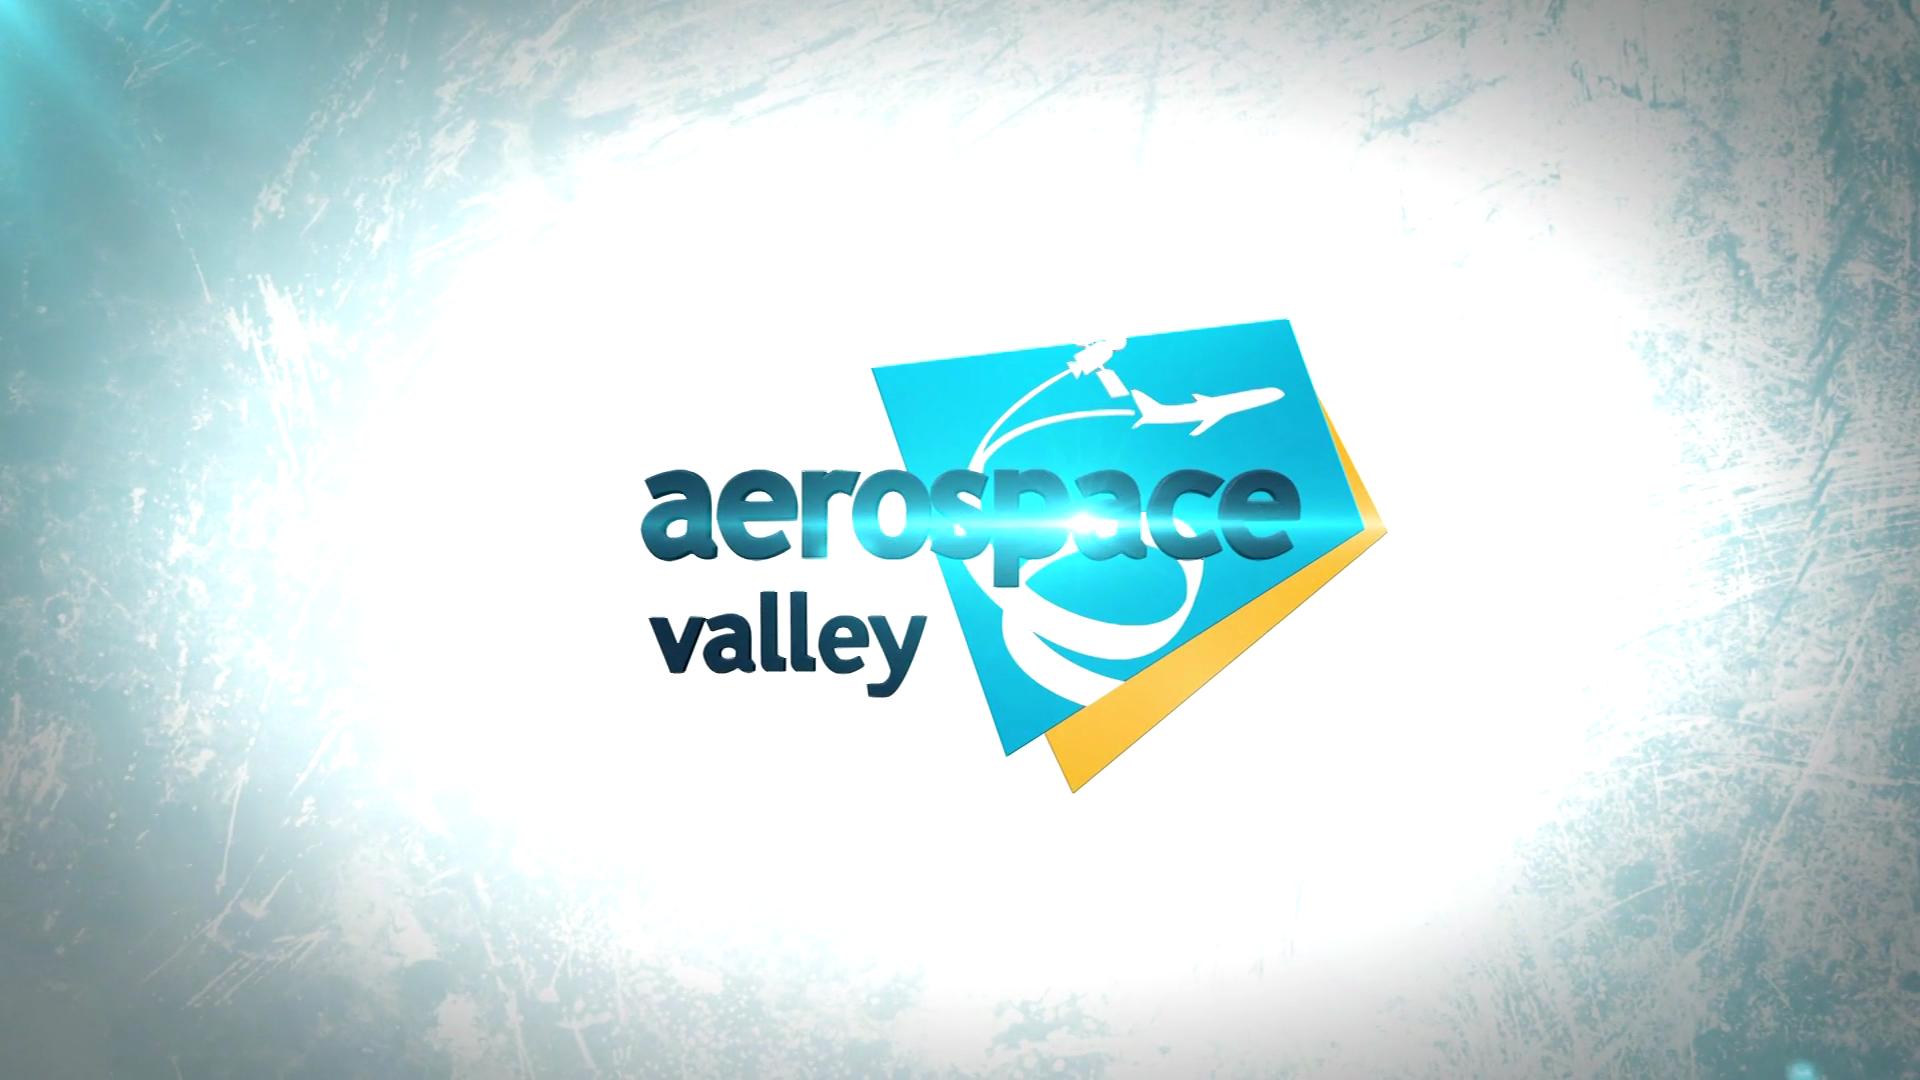 AEROSPACE VALLEY «Motion design»